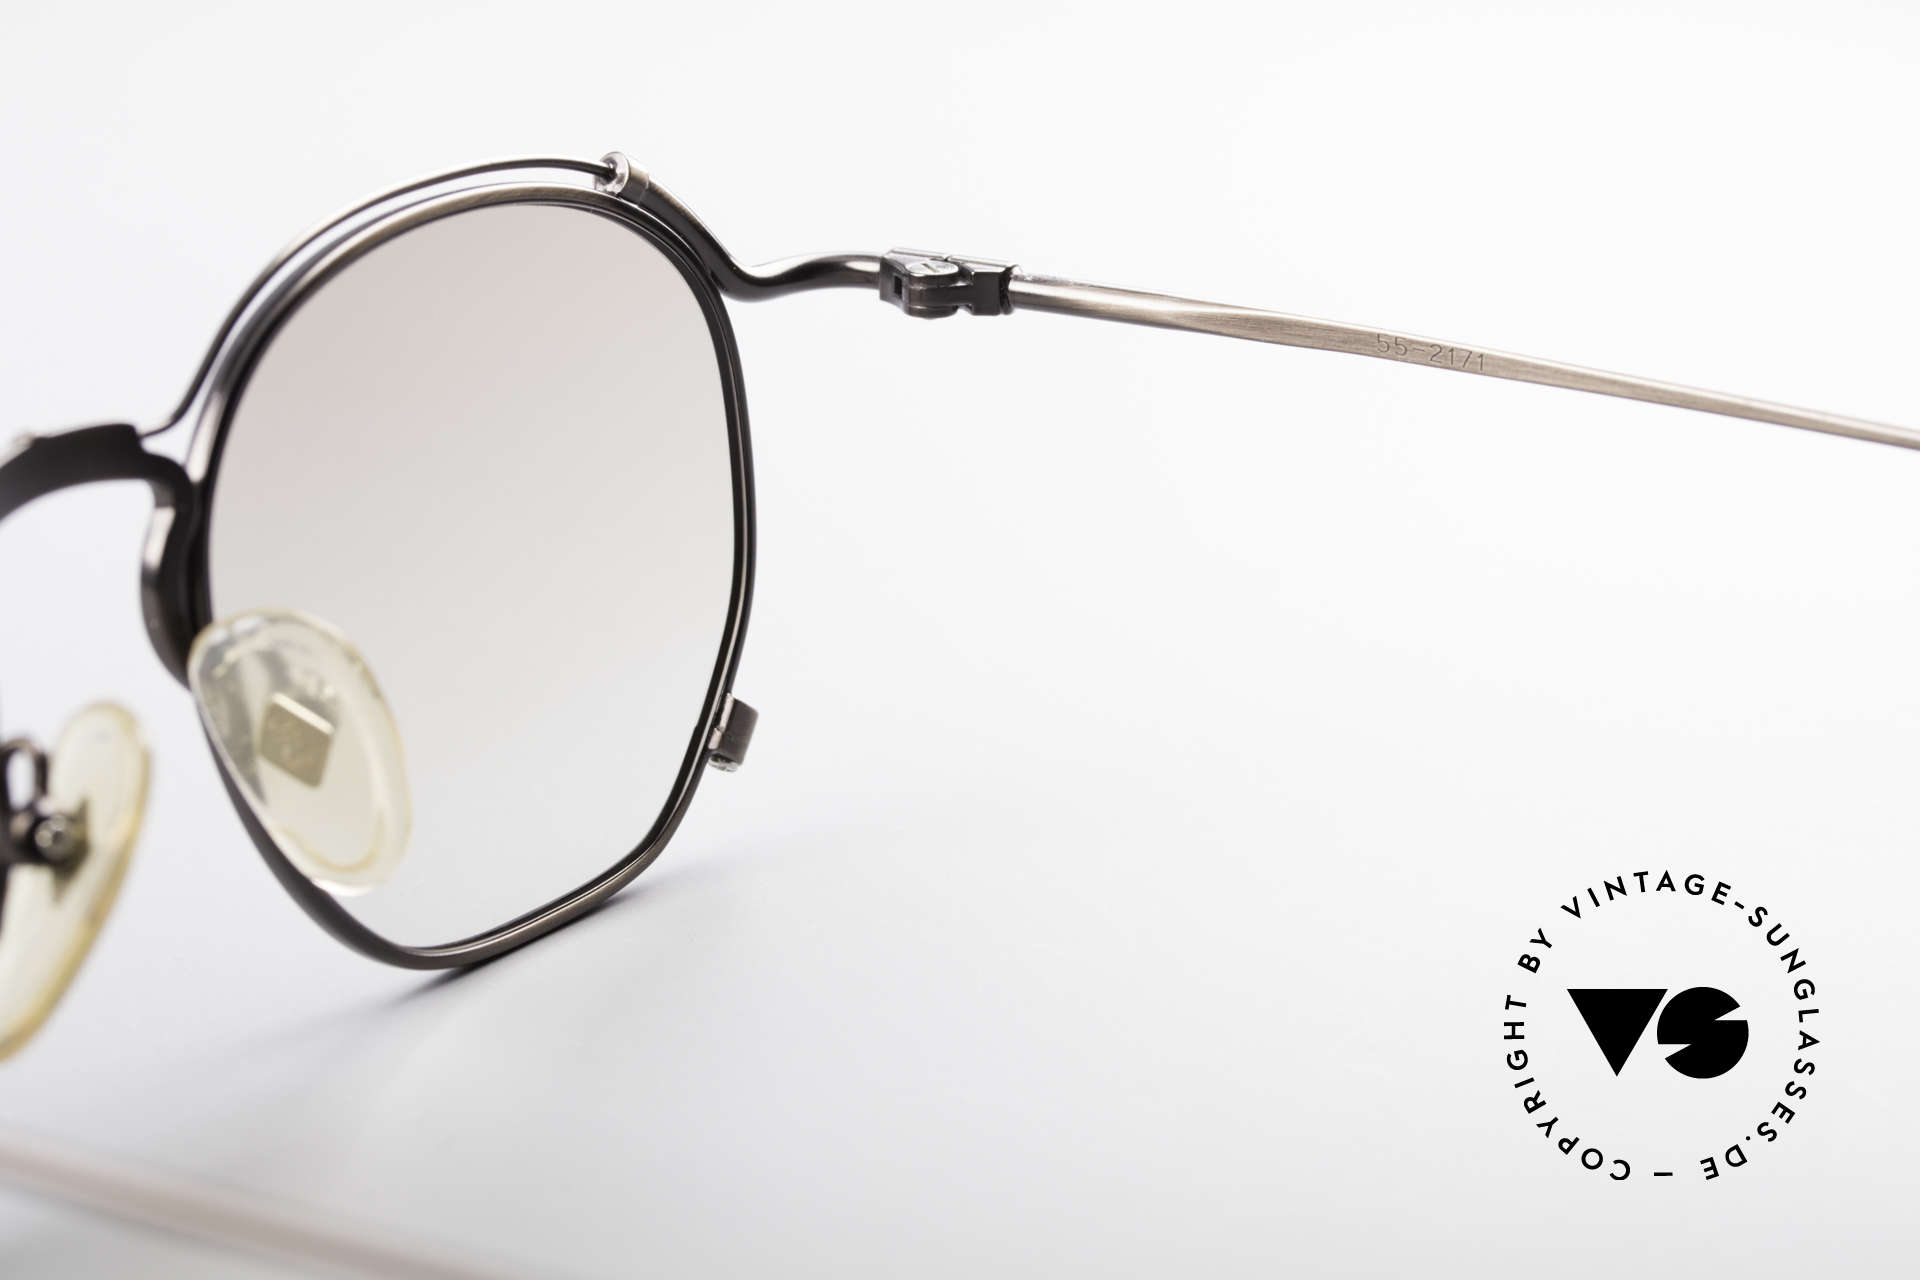 Jean Paul Gaultier 55-2171 90's Vintage JPG Frame, Size: medium, Made for Men and Women